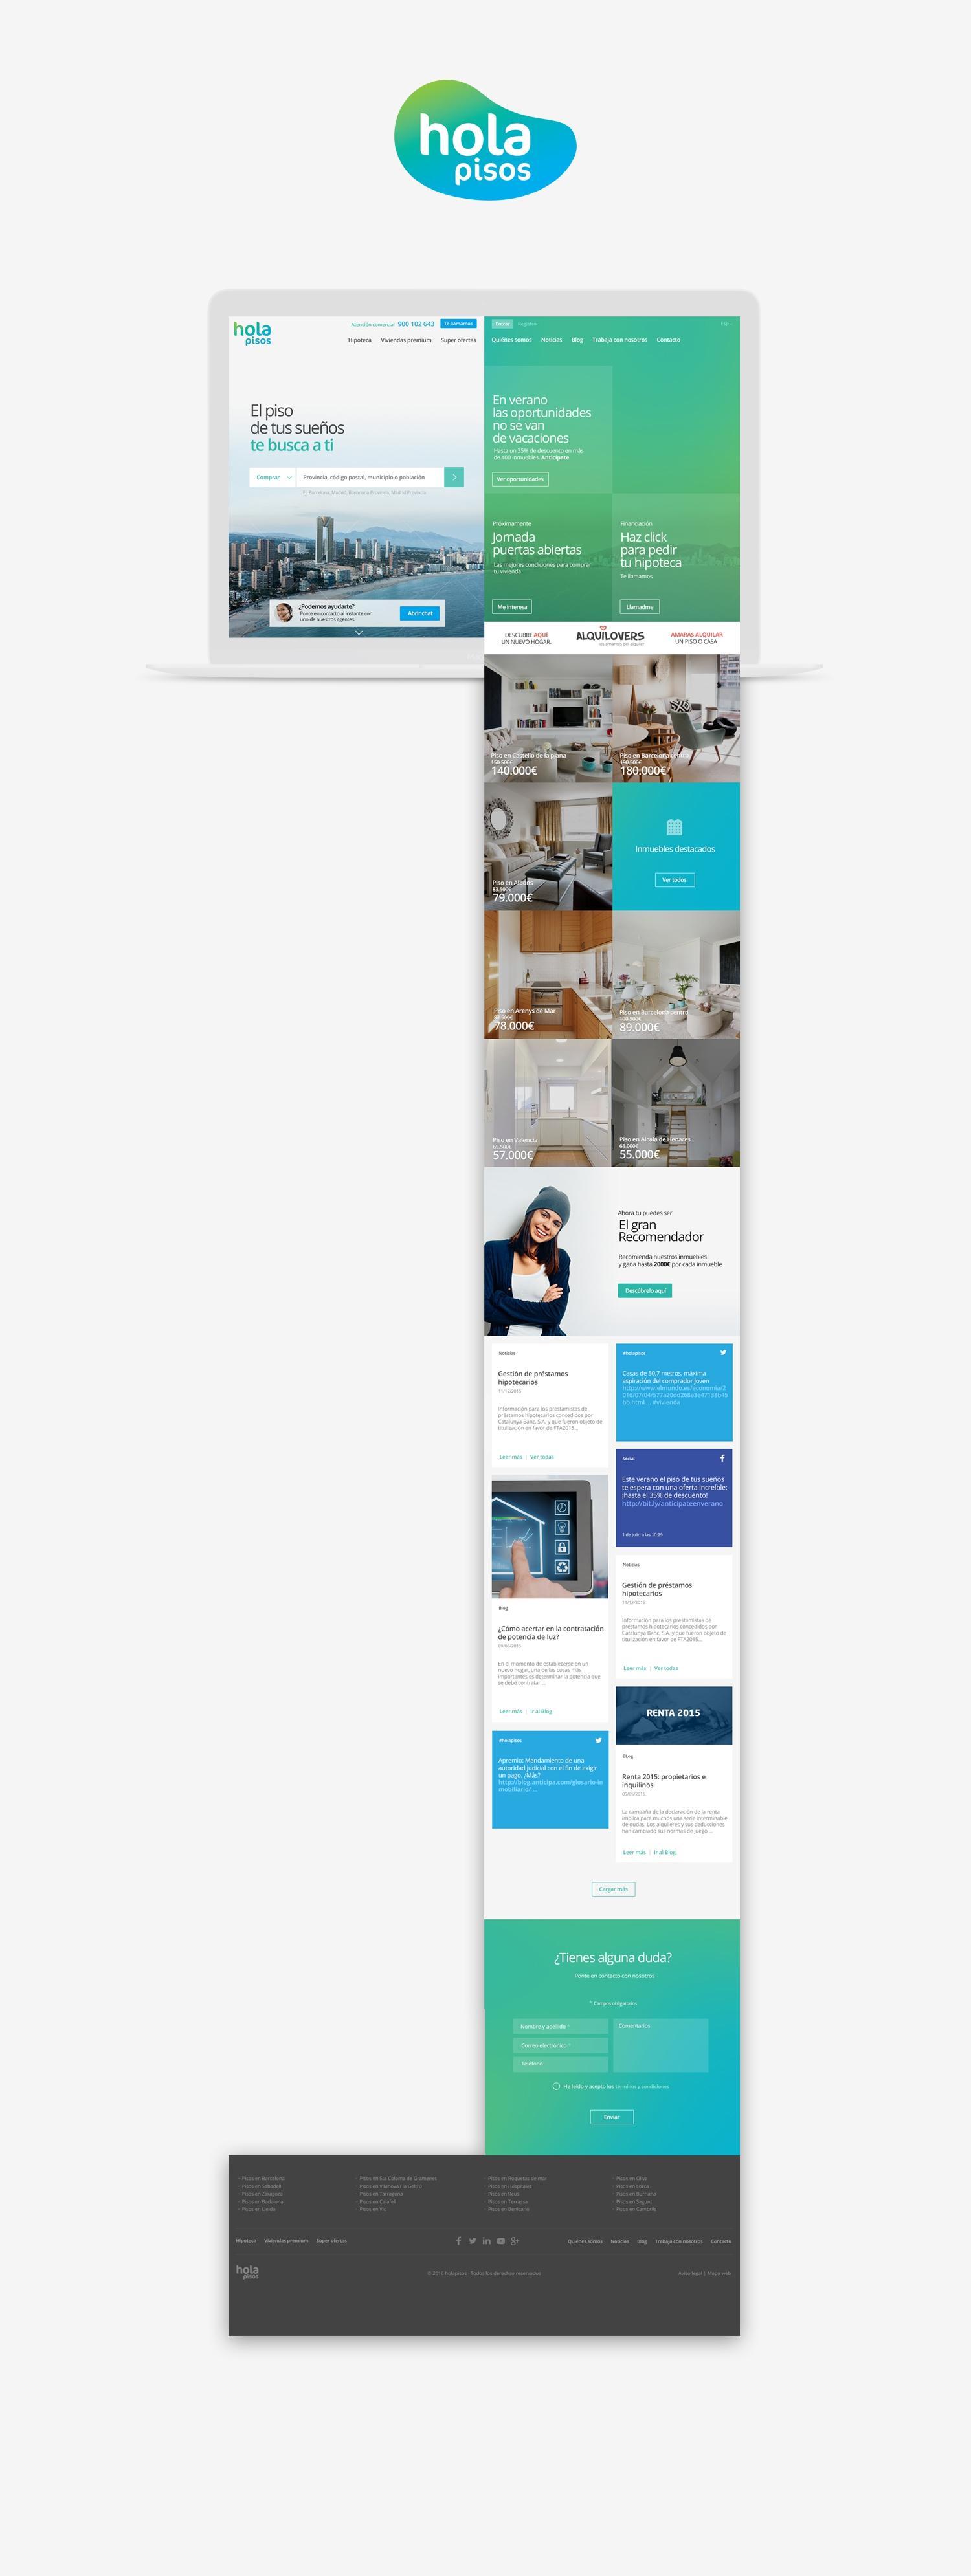 Diseño web · Hola Pisos · Samuel Matito · diseñador freelance